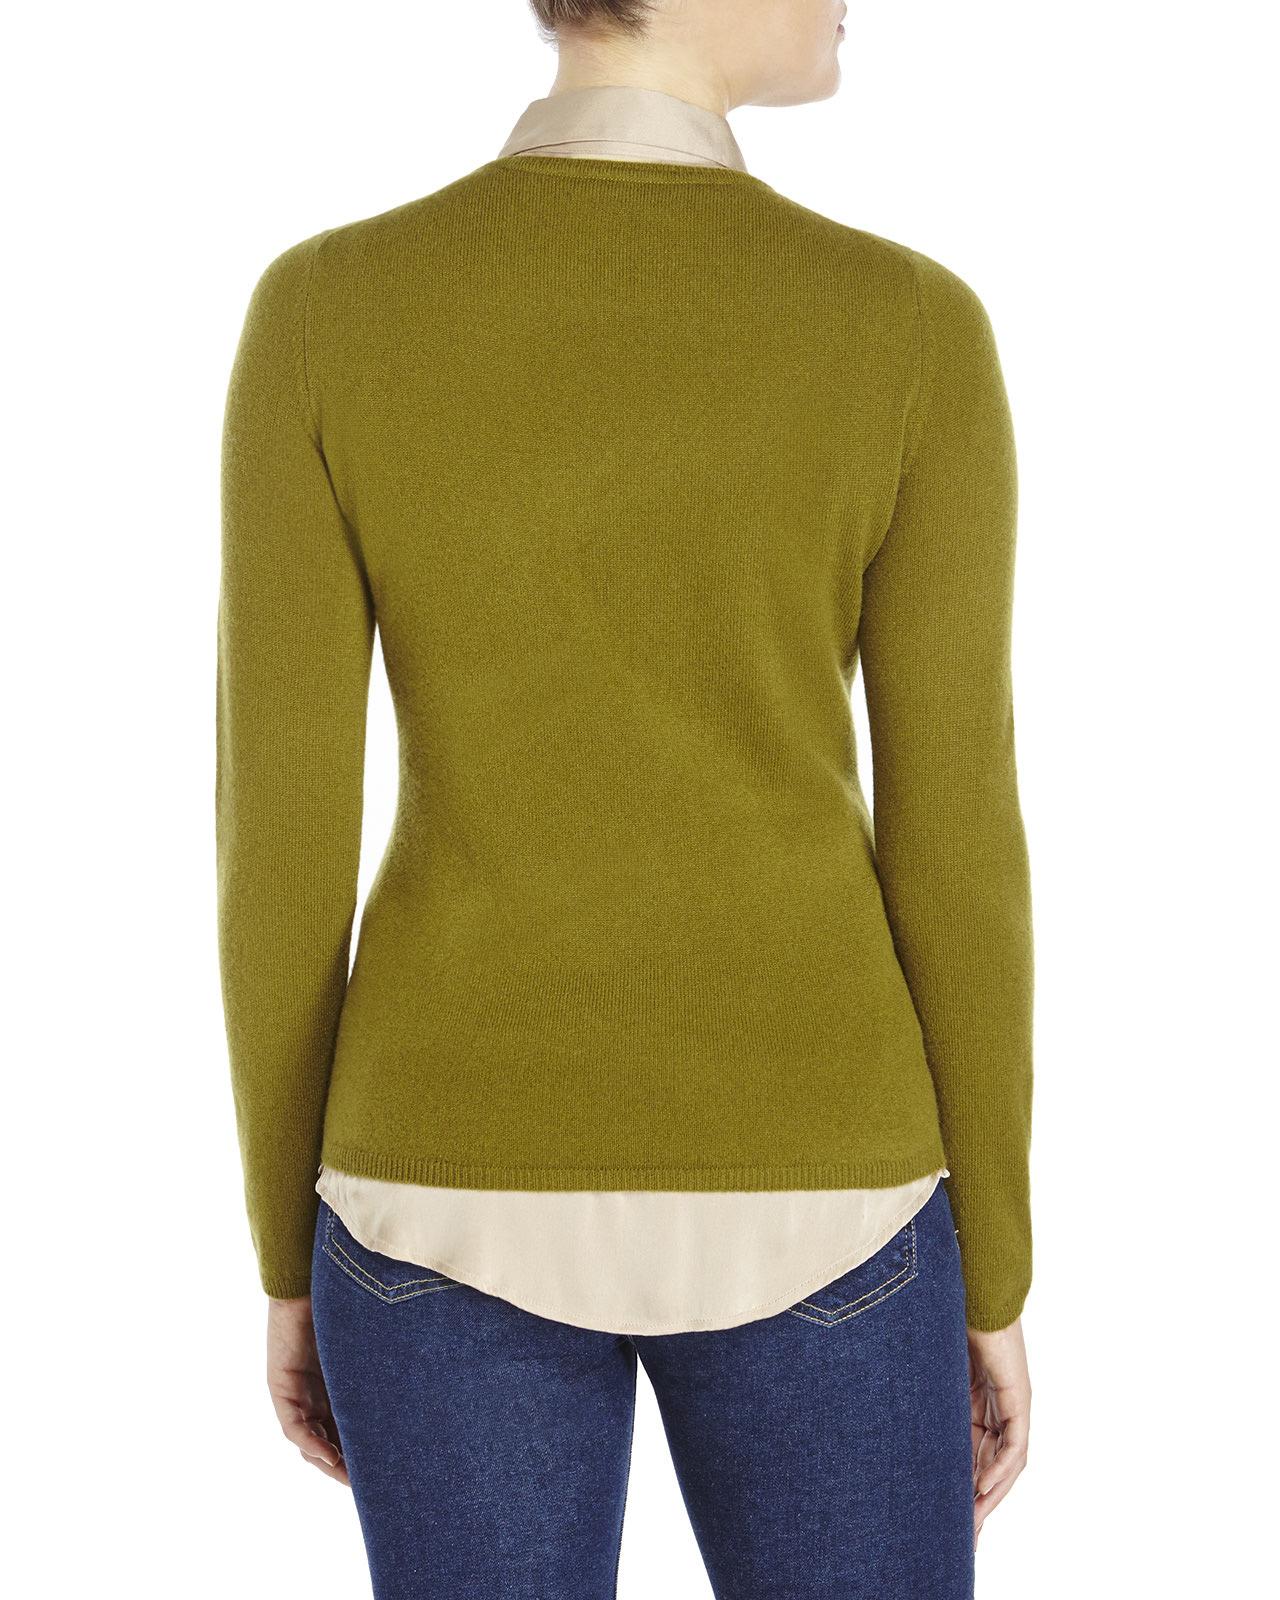 Knitting V Neck Neckband : Lyst in cashmere v neck knit sweater green